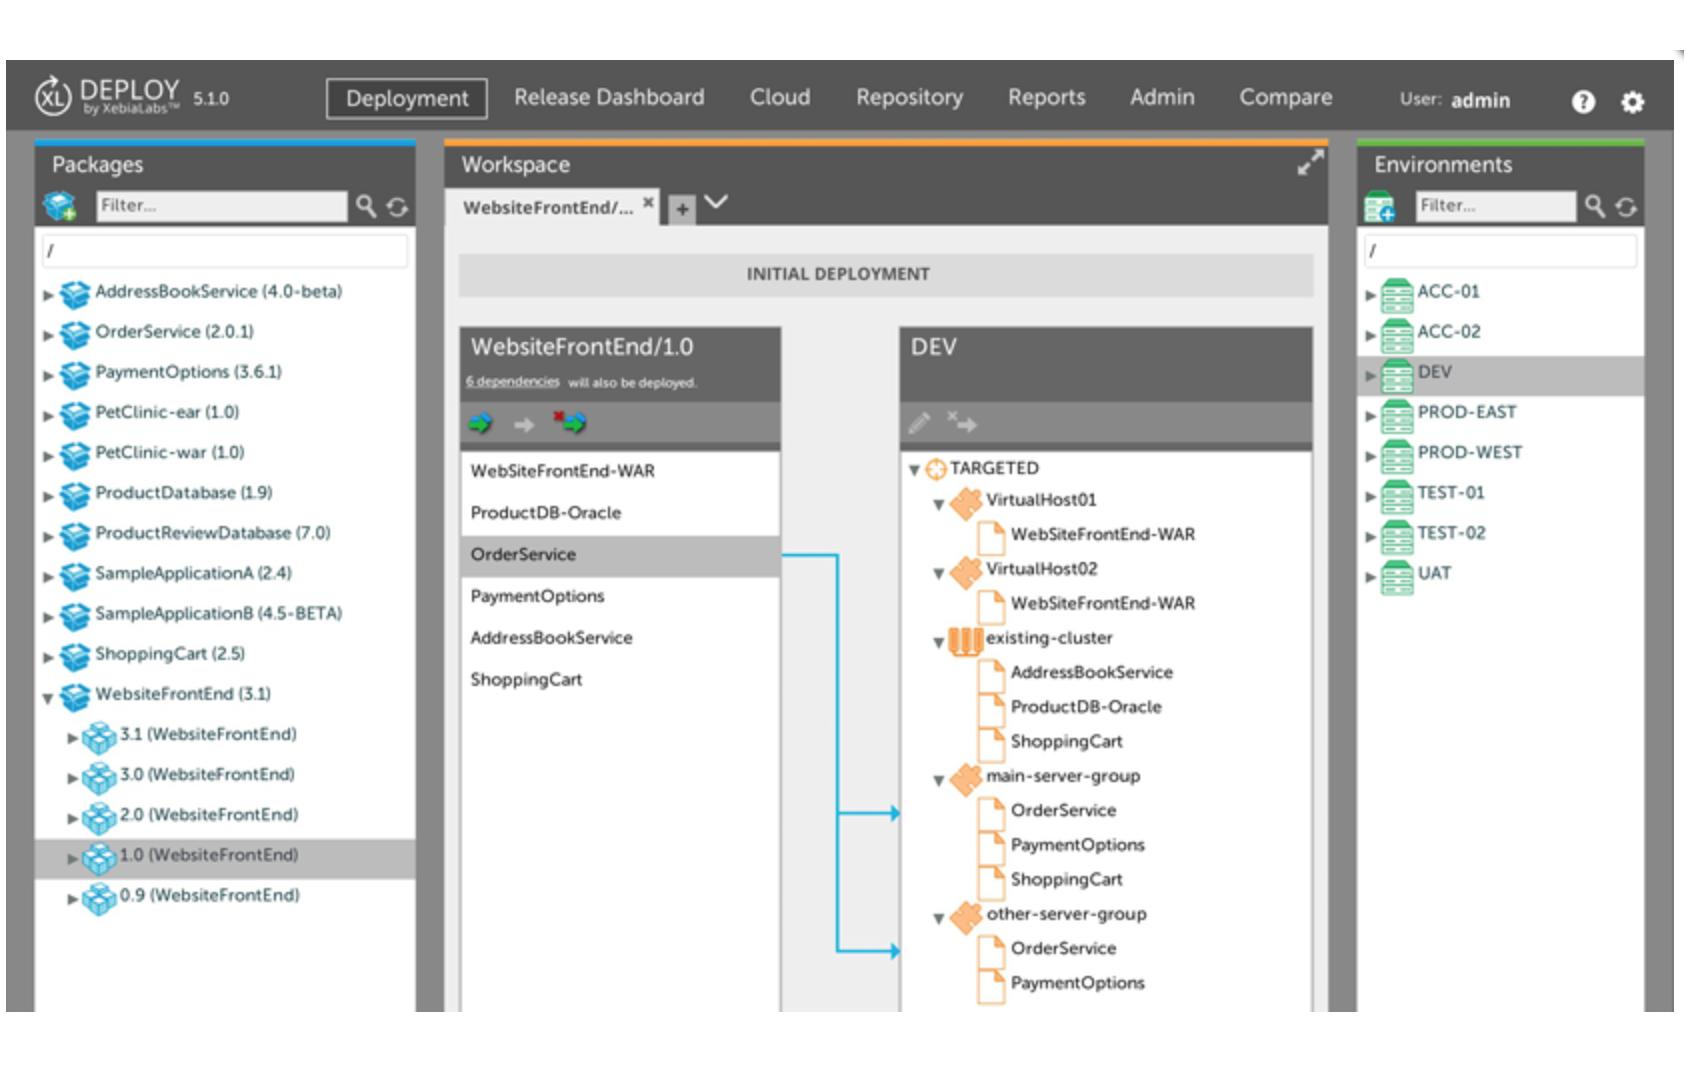 xl-deploy-model-based-approach